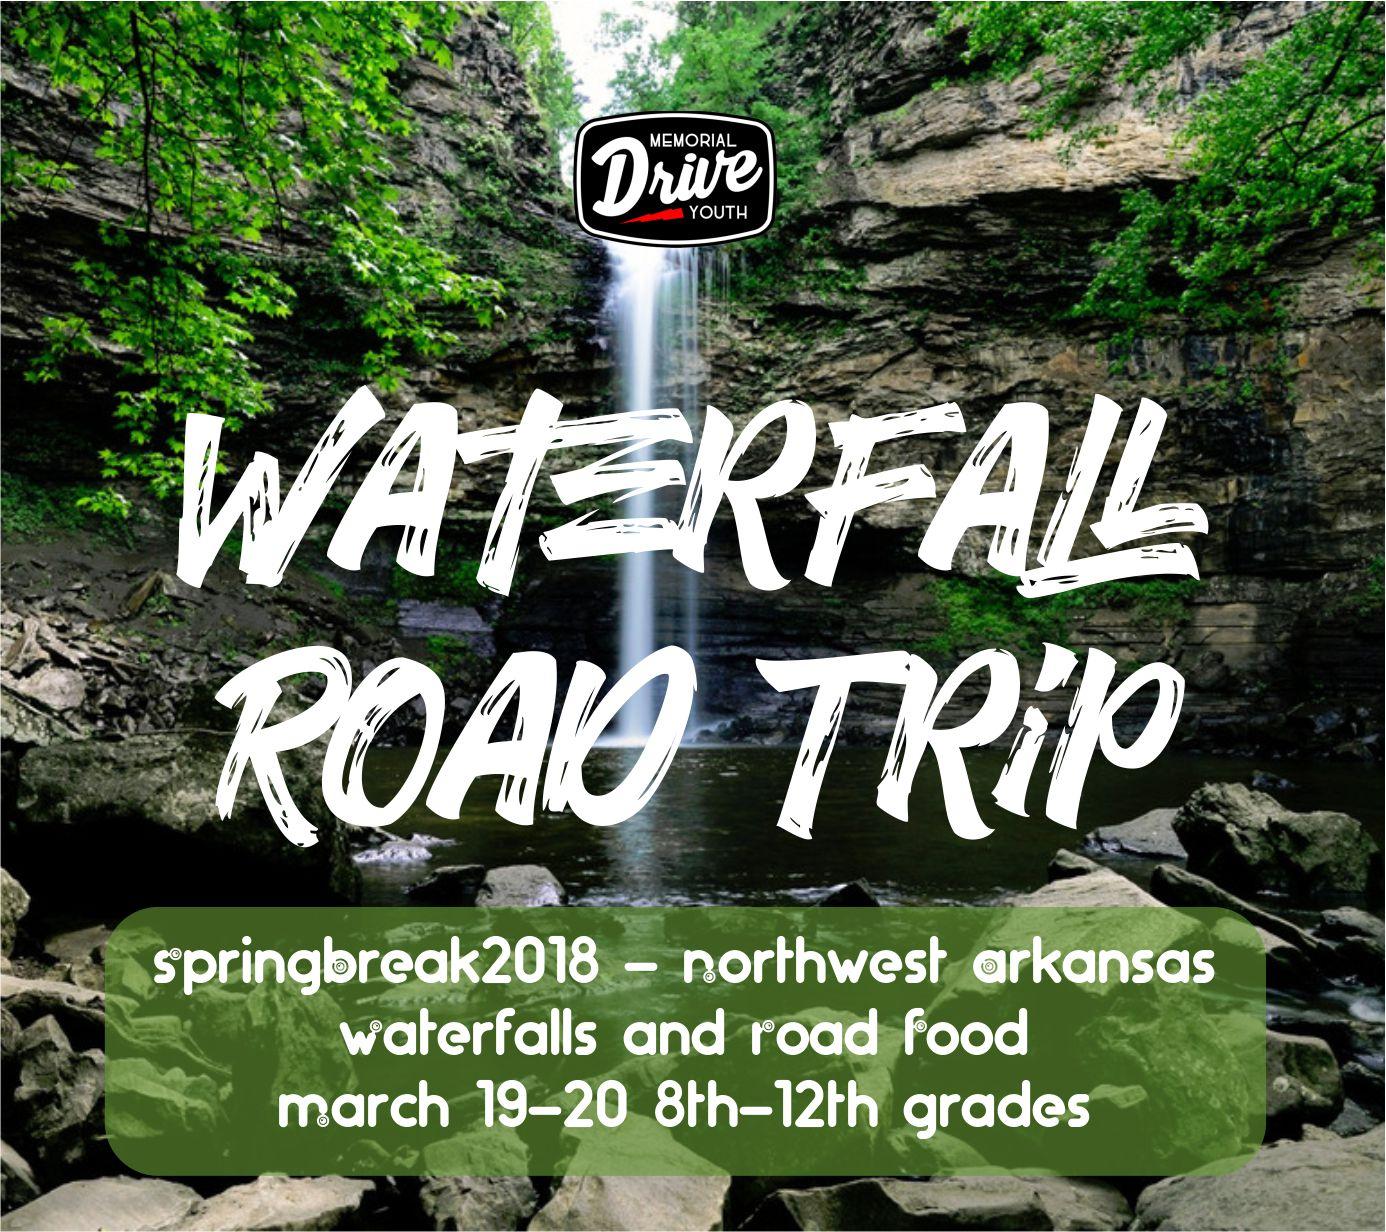 Waterfall road trip 2018